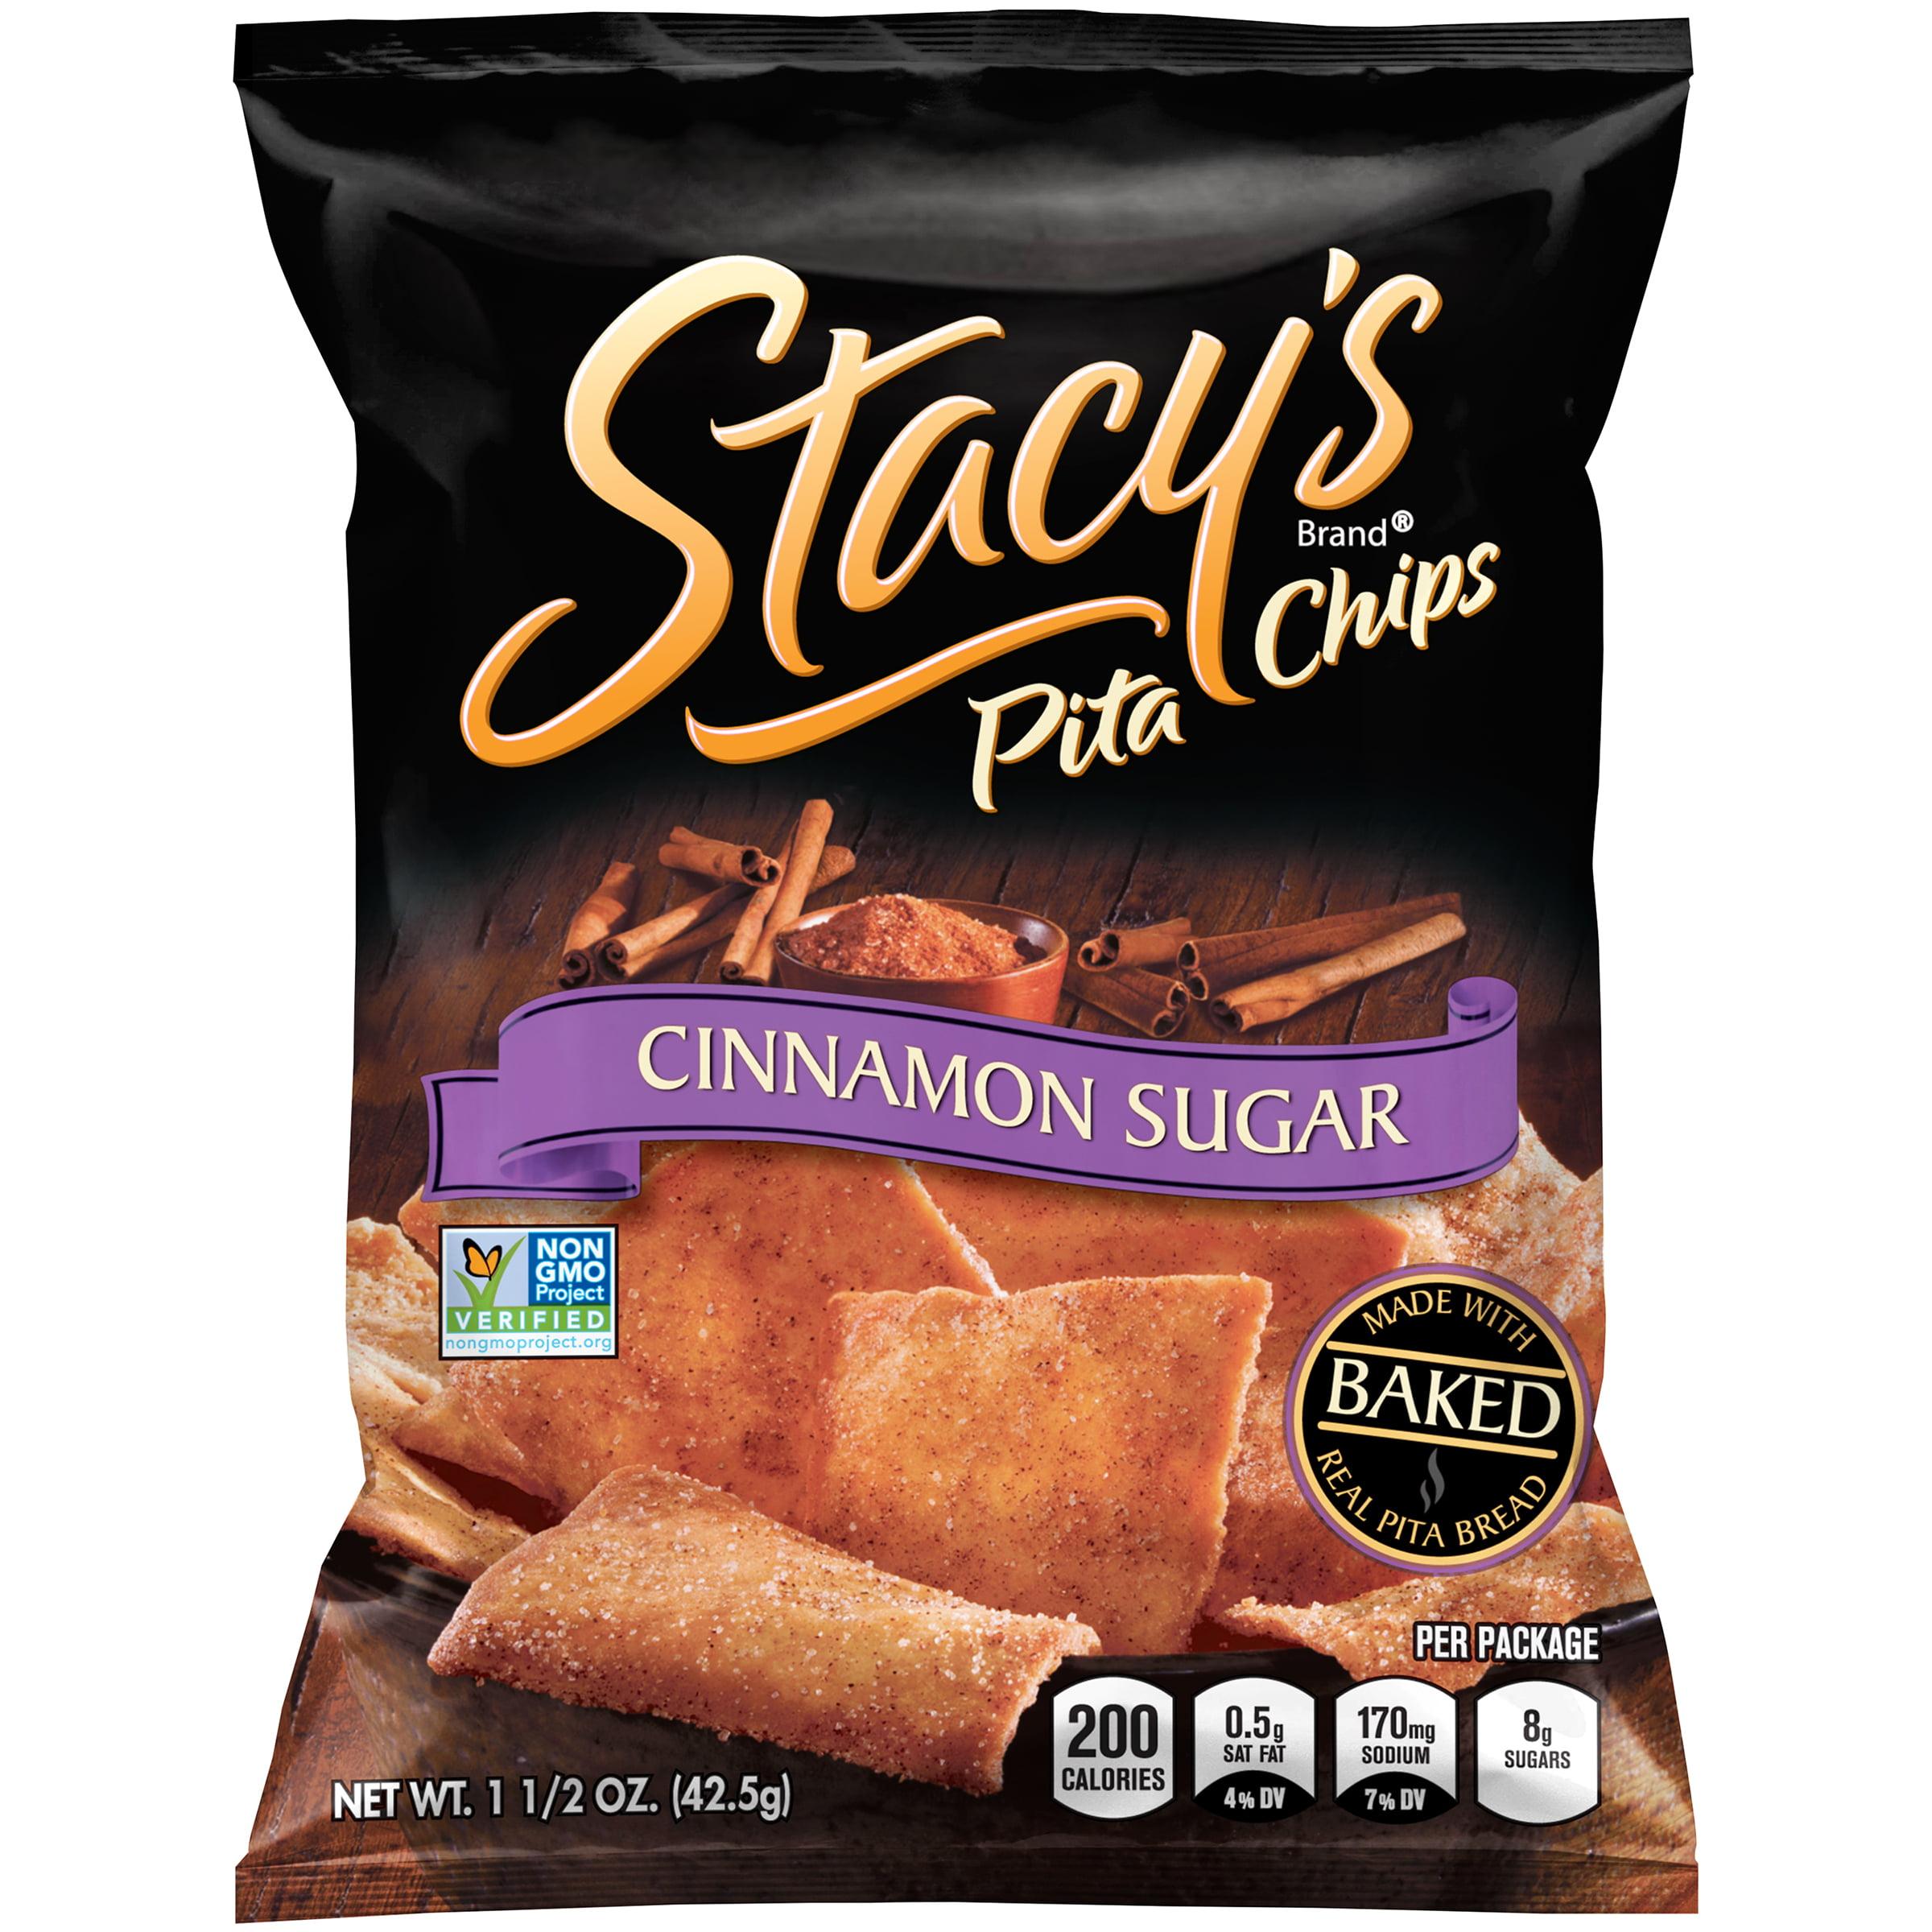 Stacys cinnamon sugar pita chips